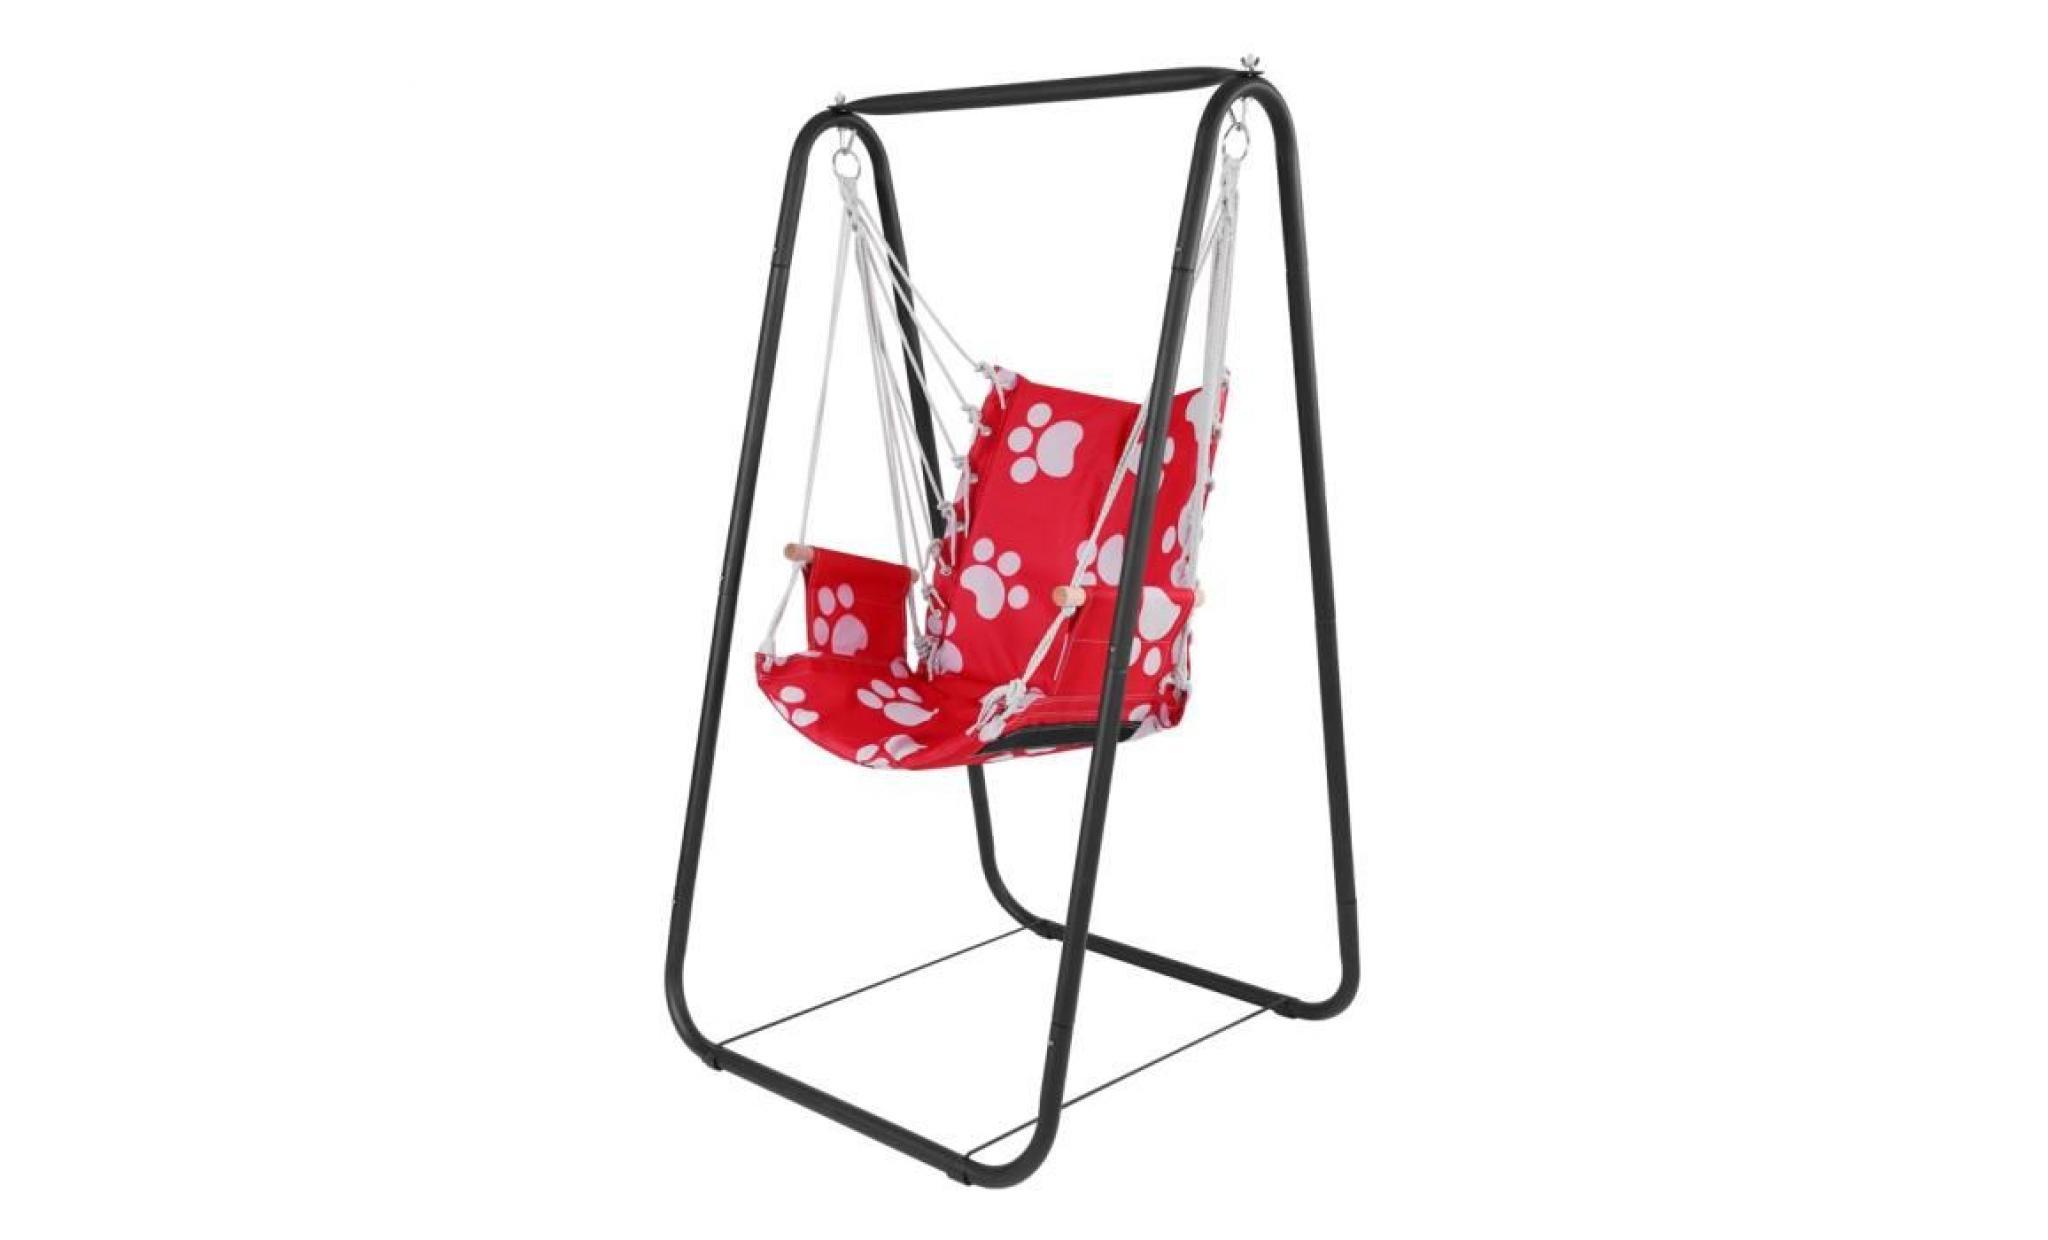 si ge de balan oire pour enfant garden yard hamac si ge. Black Bedroom Furniture Sets. Home Design Ideas